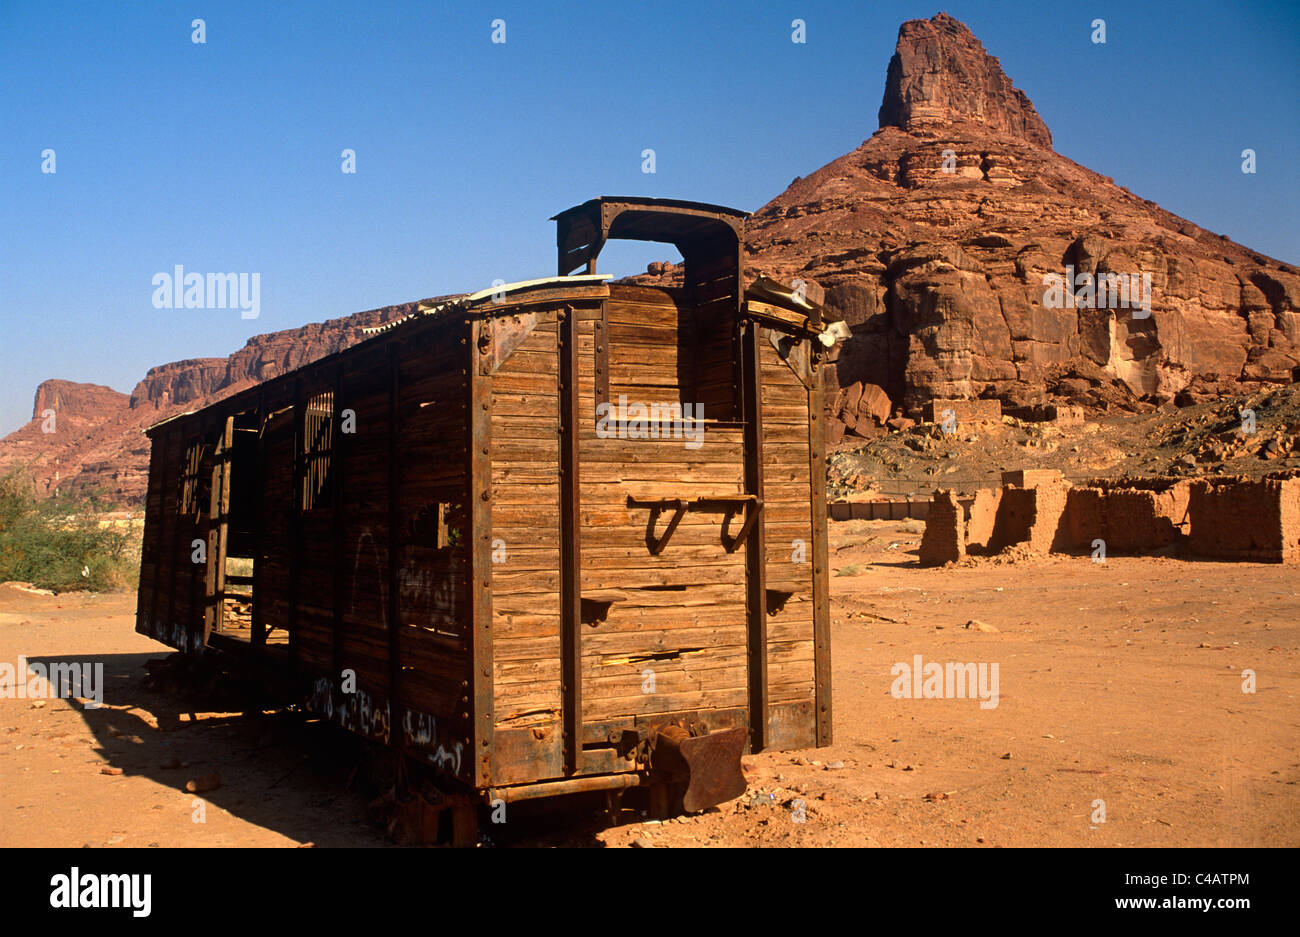 Saudi Arabia, Madinah, Al-Ula. Remnants of the famous Hejaz Railway, including this abandoned cargo wagon, - Stock Image